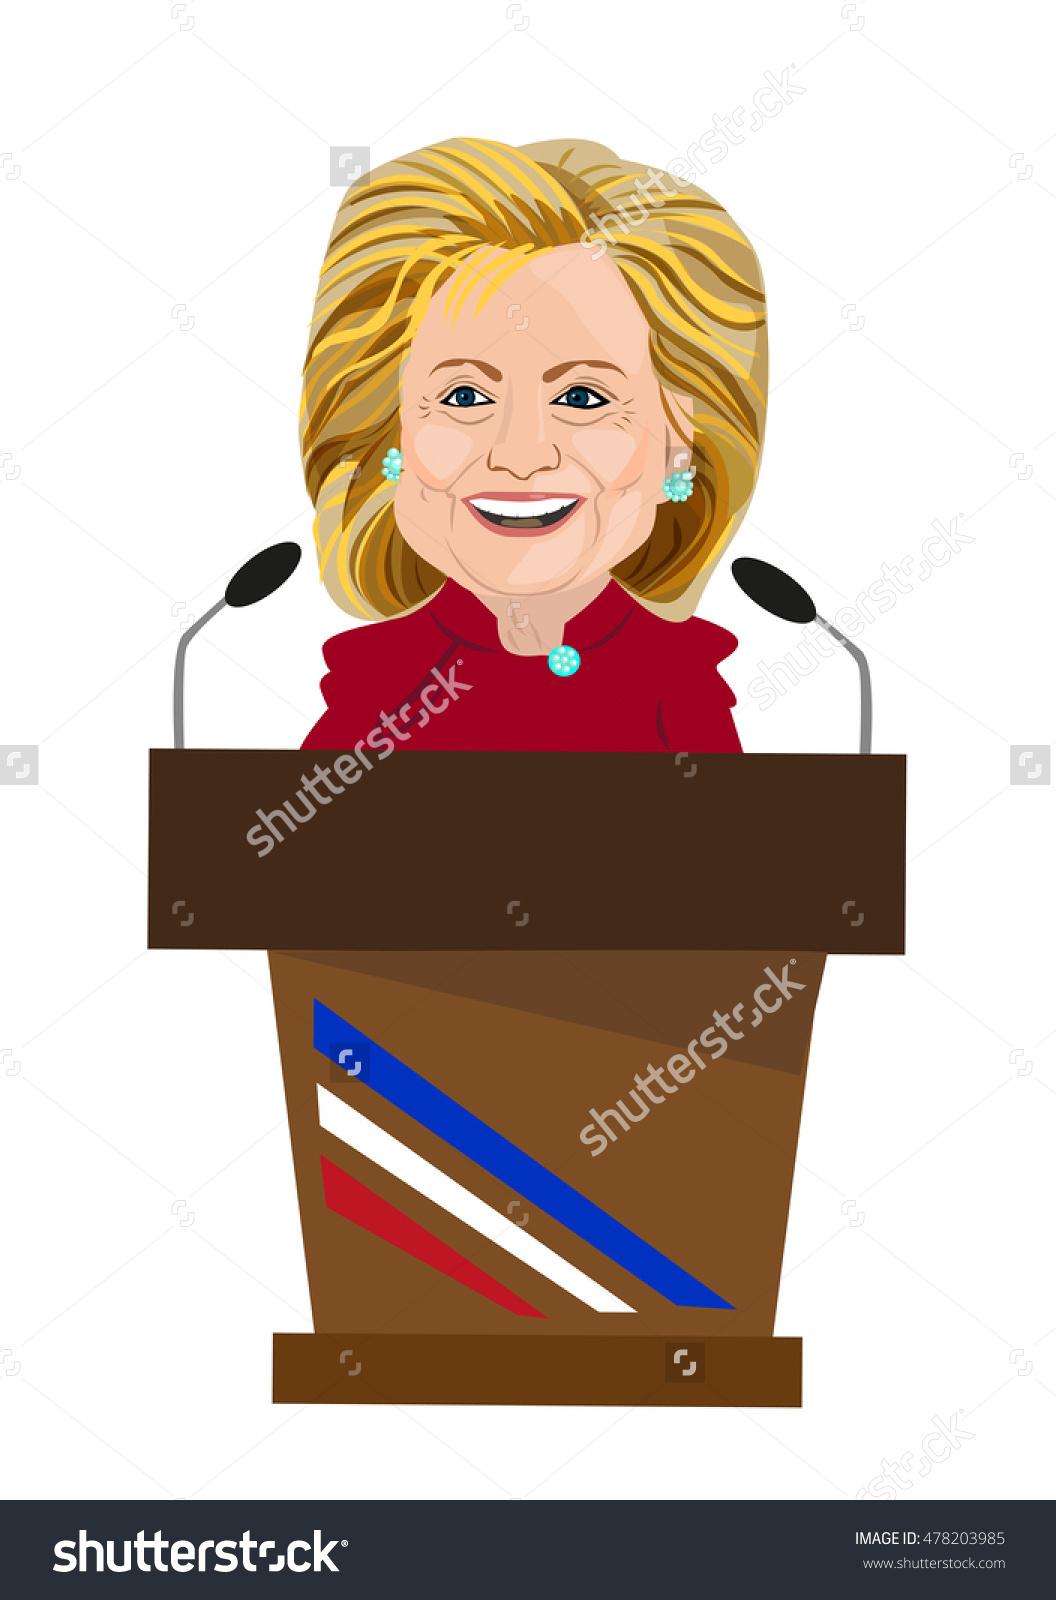 September 4 2016 Caricature Hillary Clinton Stock Vector 478203985.